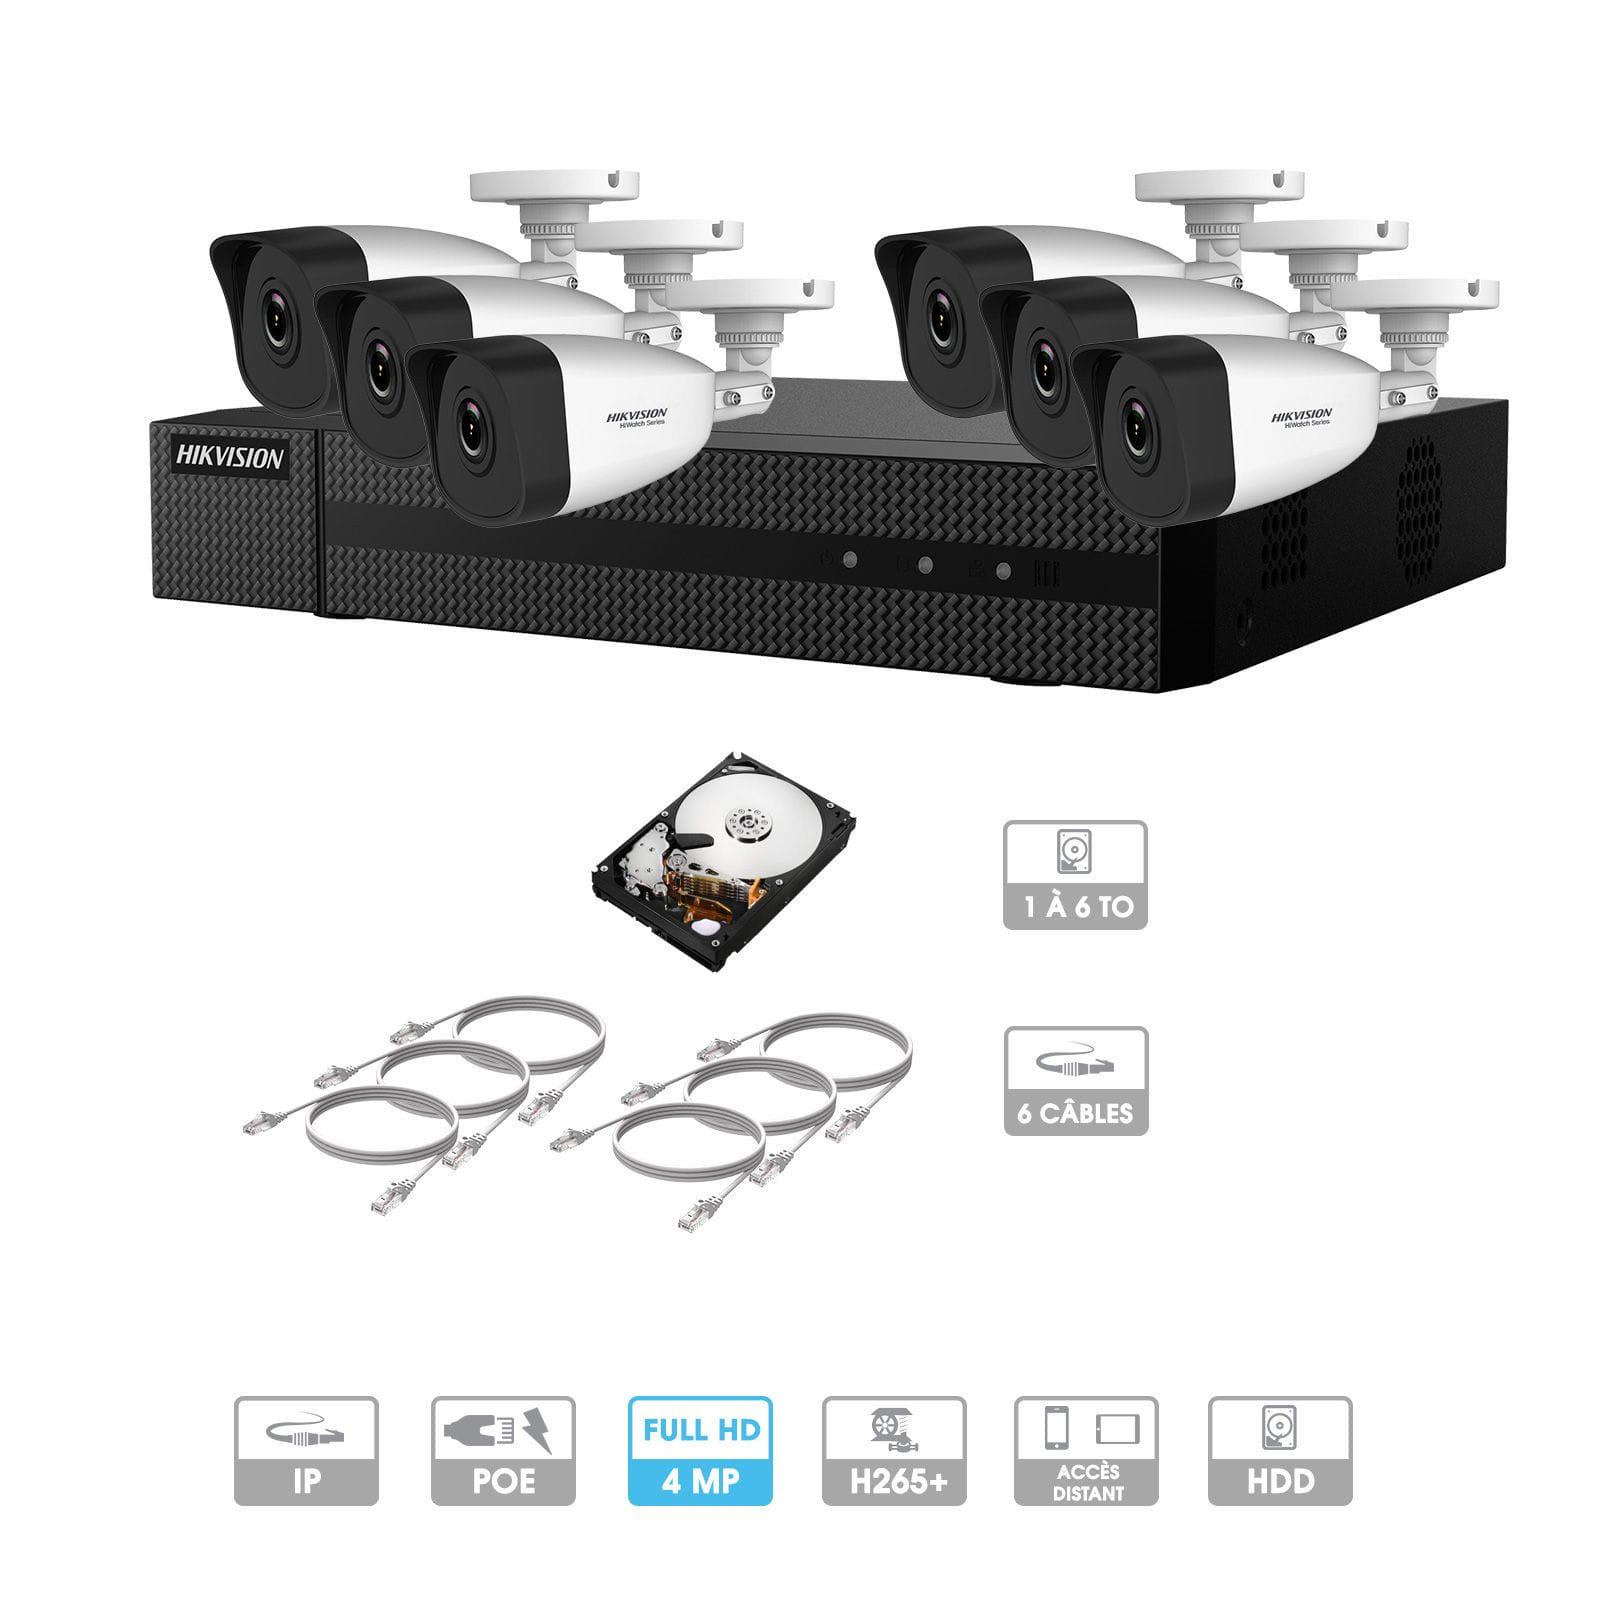 Kit vidéosurveillance 6 caméras | 4 MP | IP PoE | 6 câbles RJ45 20/30/40/50 mètres | HDD 1 à 6 To | Tube Hiwatch